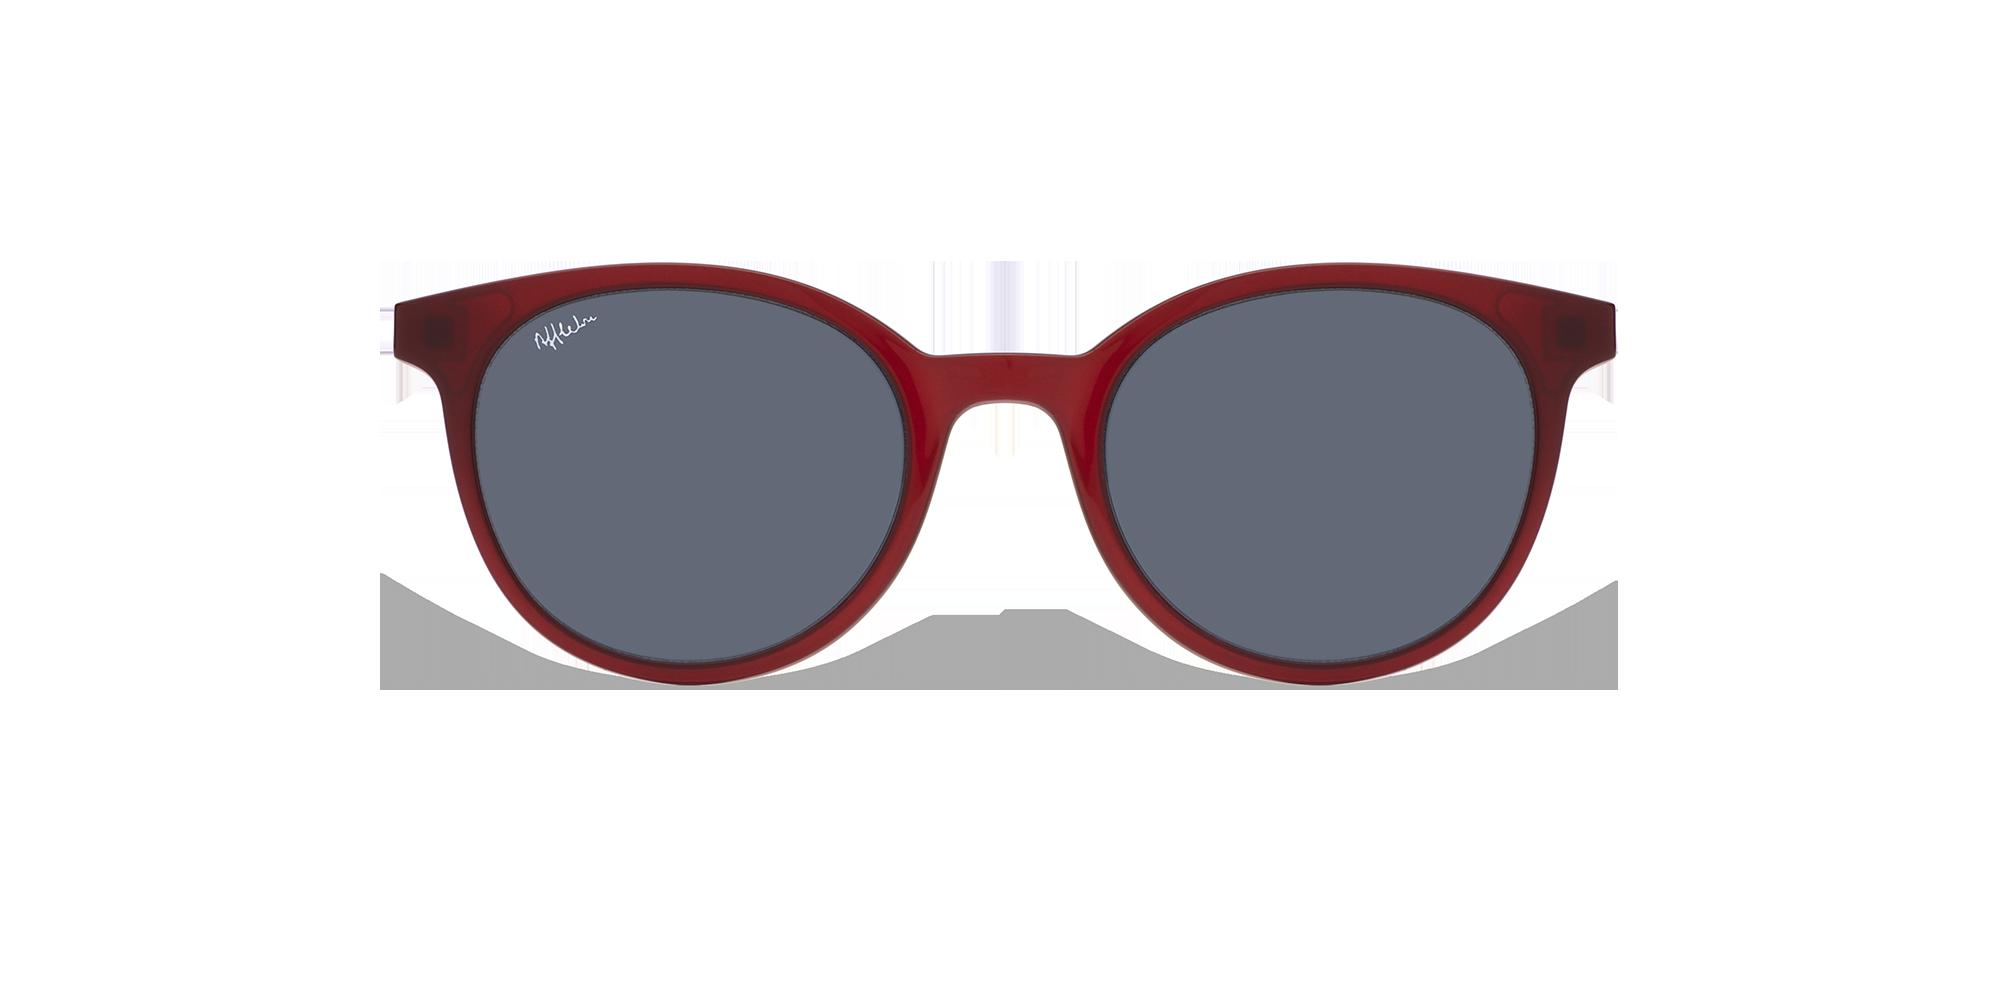 afflelou/france/products/smart_clip/clips_glasses/TMK36SURD014819.png